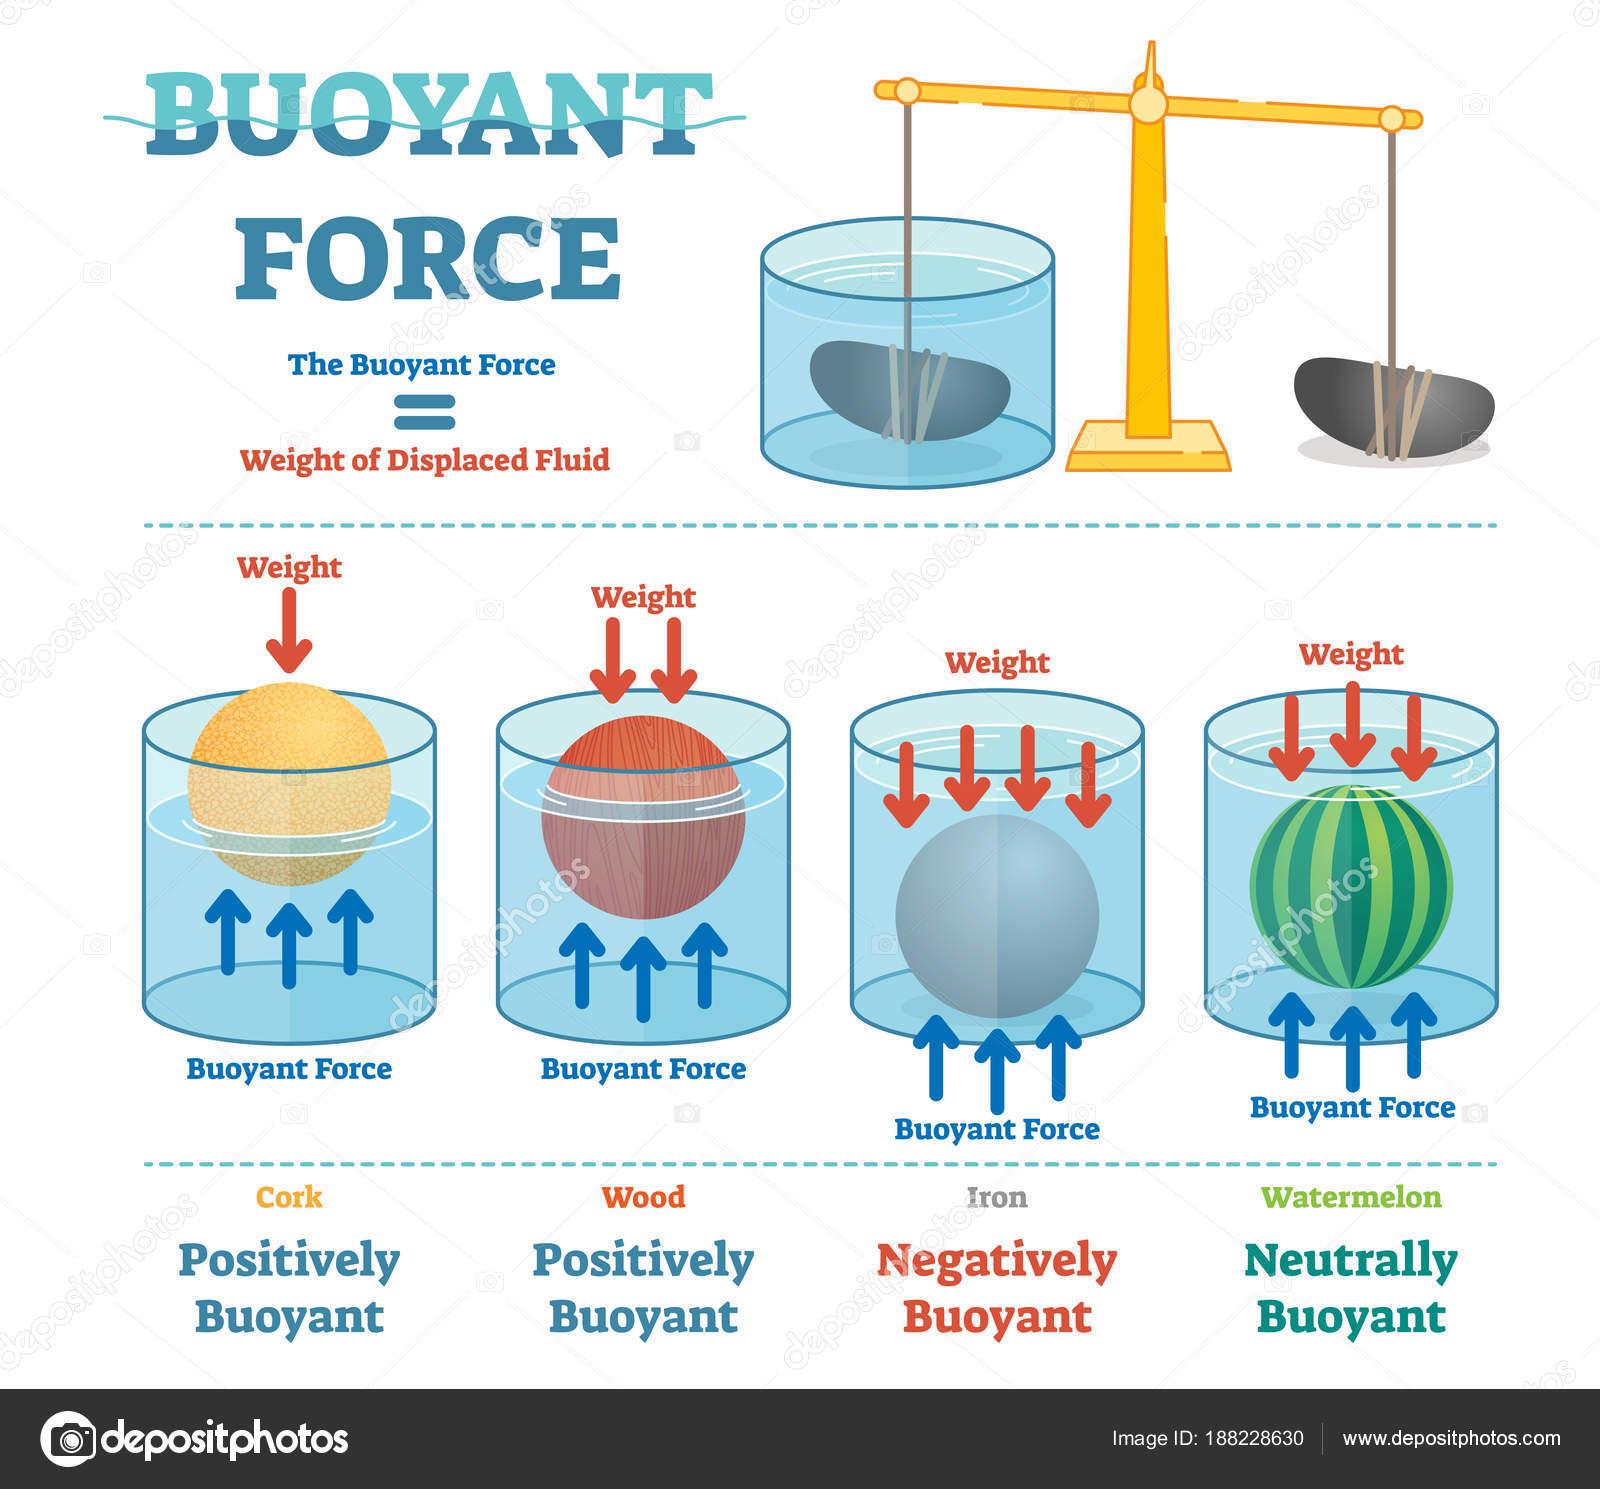 buoyant force illustrative educational physics diagram. Black Bedroom Furniture Sets. Home Design Ideas